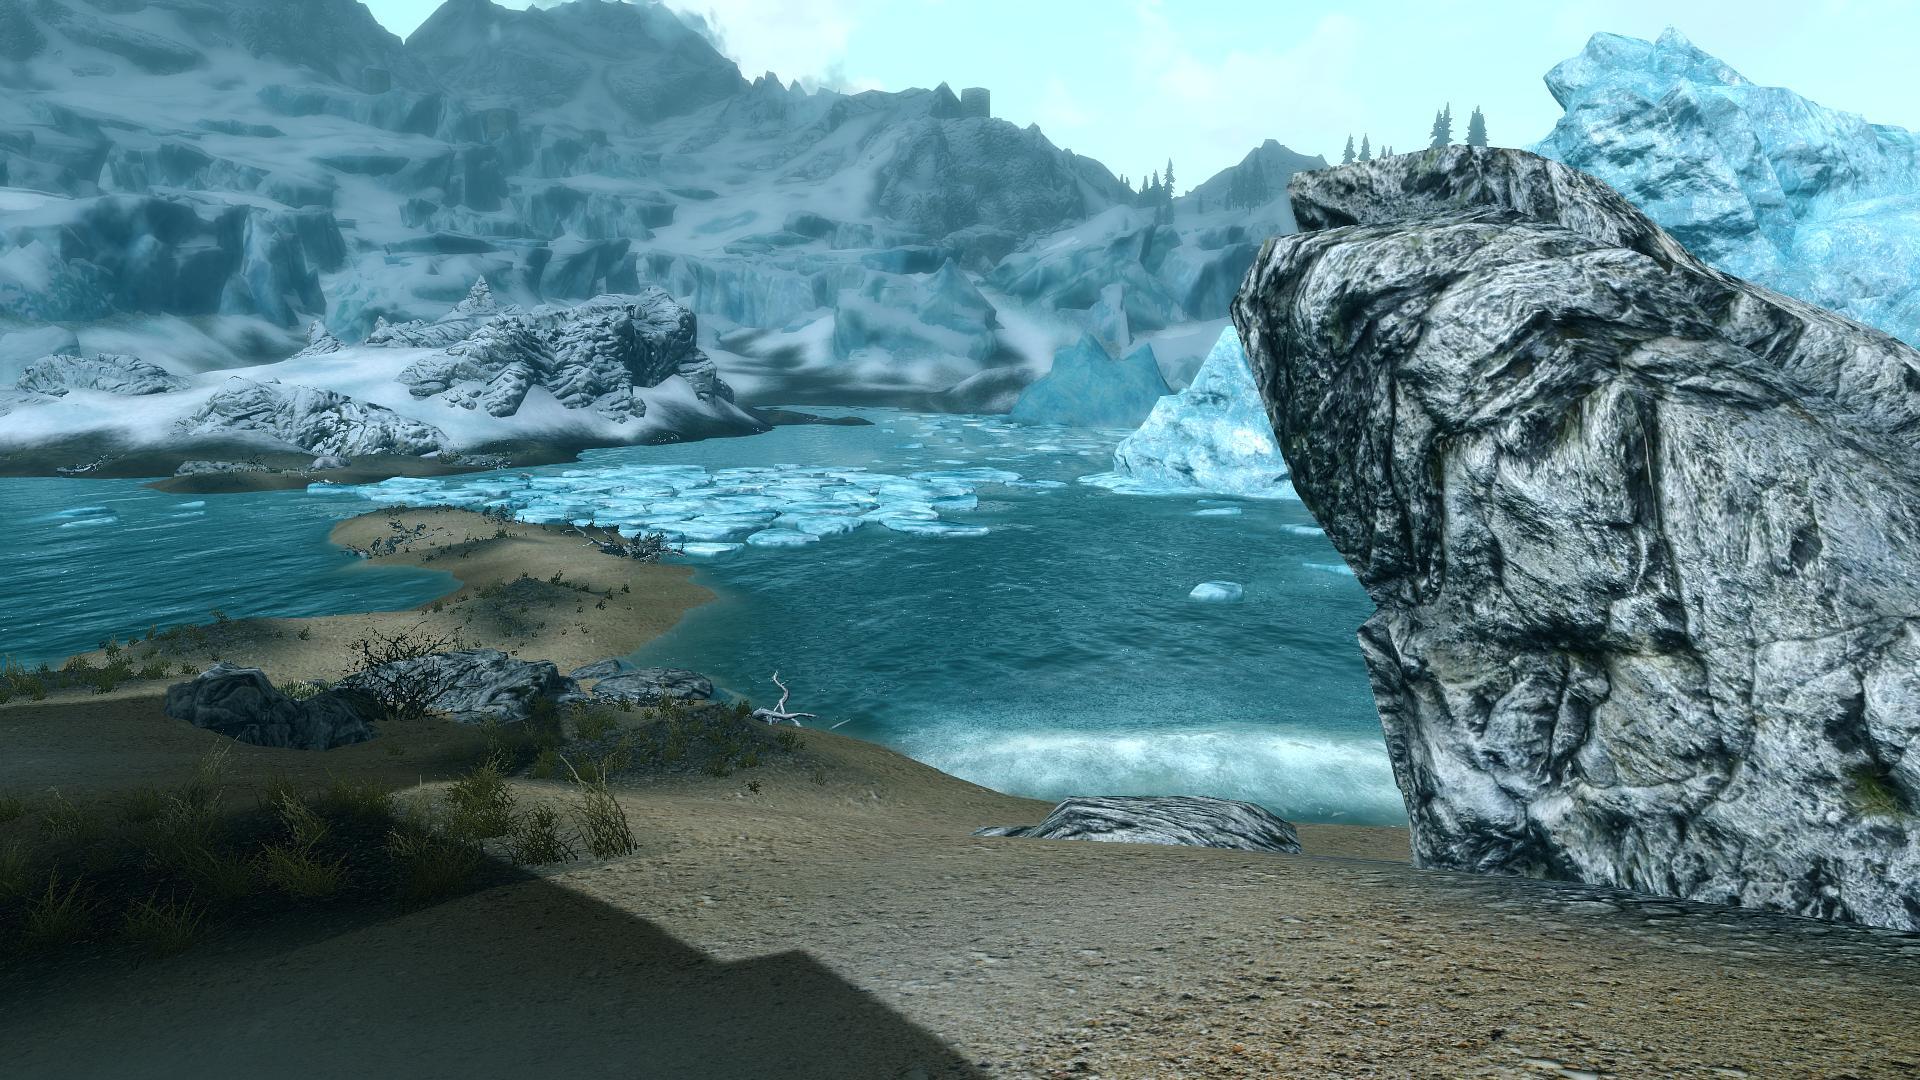 000200.Jpg - Elder Scrolls 5: Skyrim, the